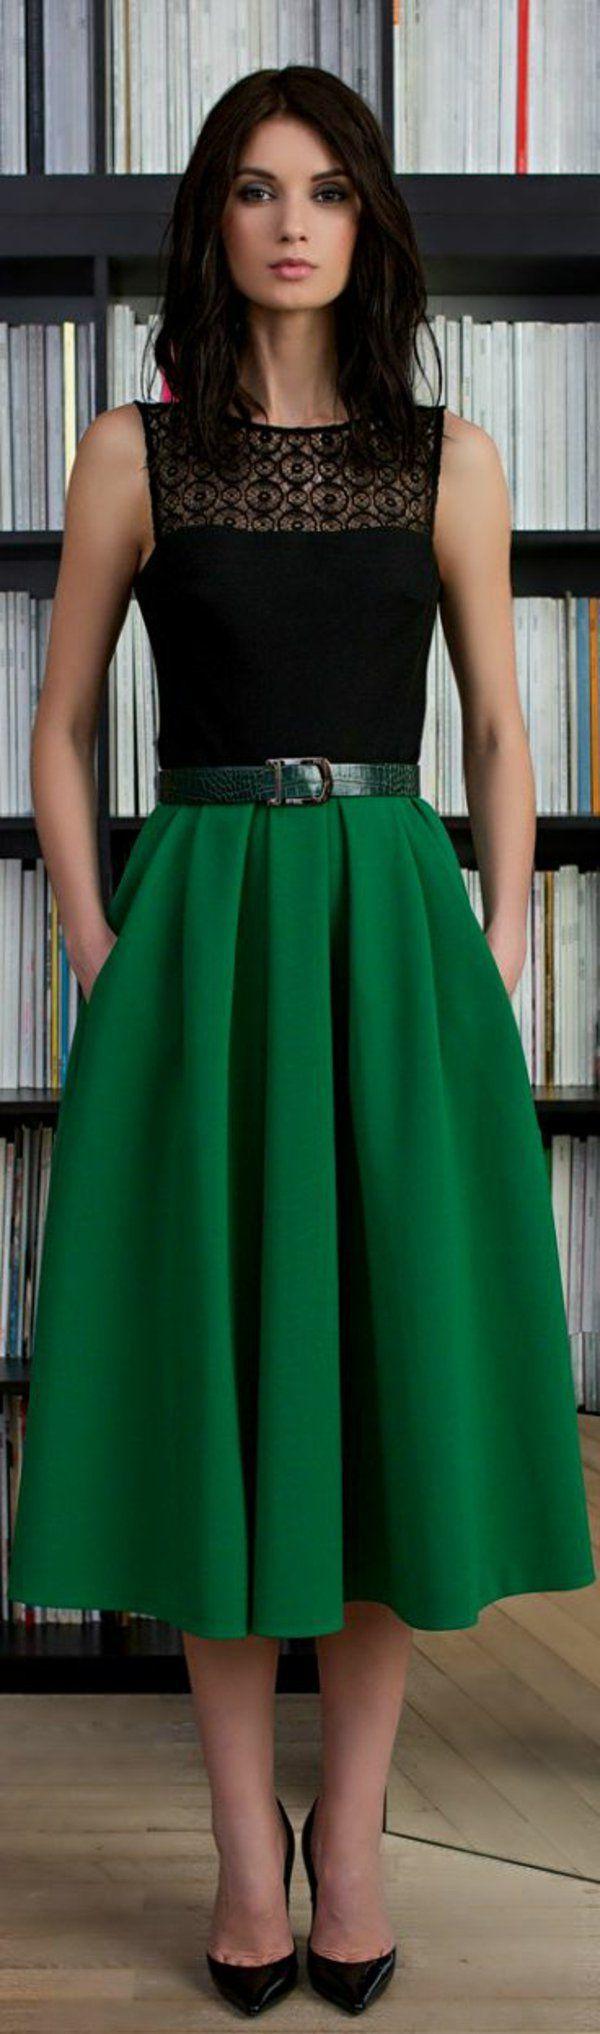 jupe longue verte